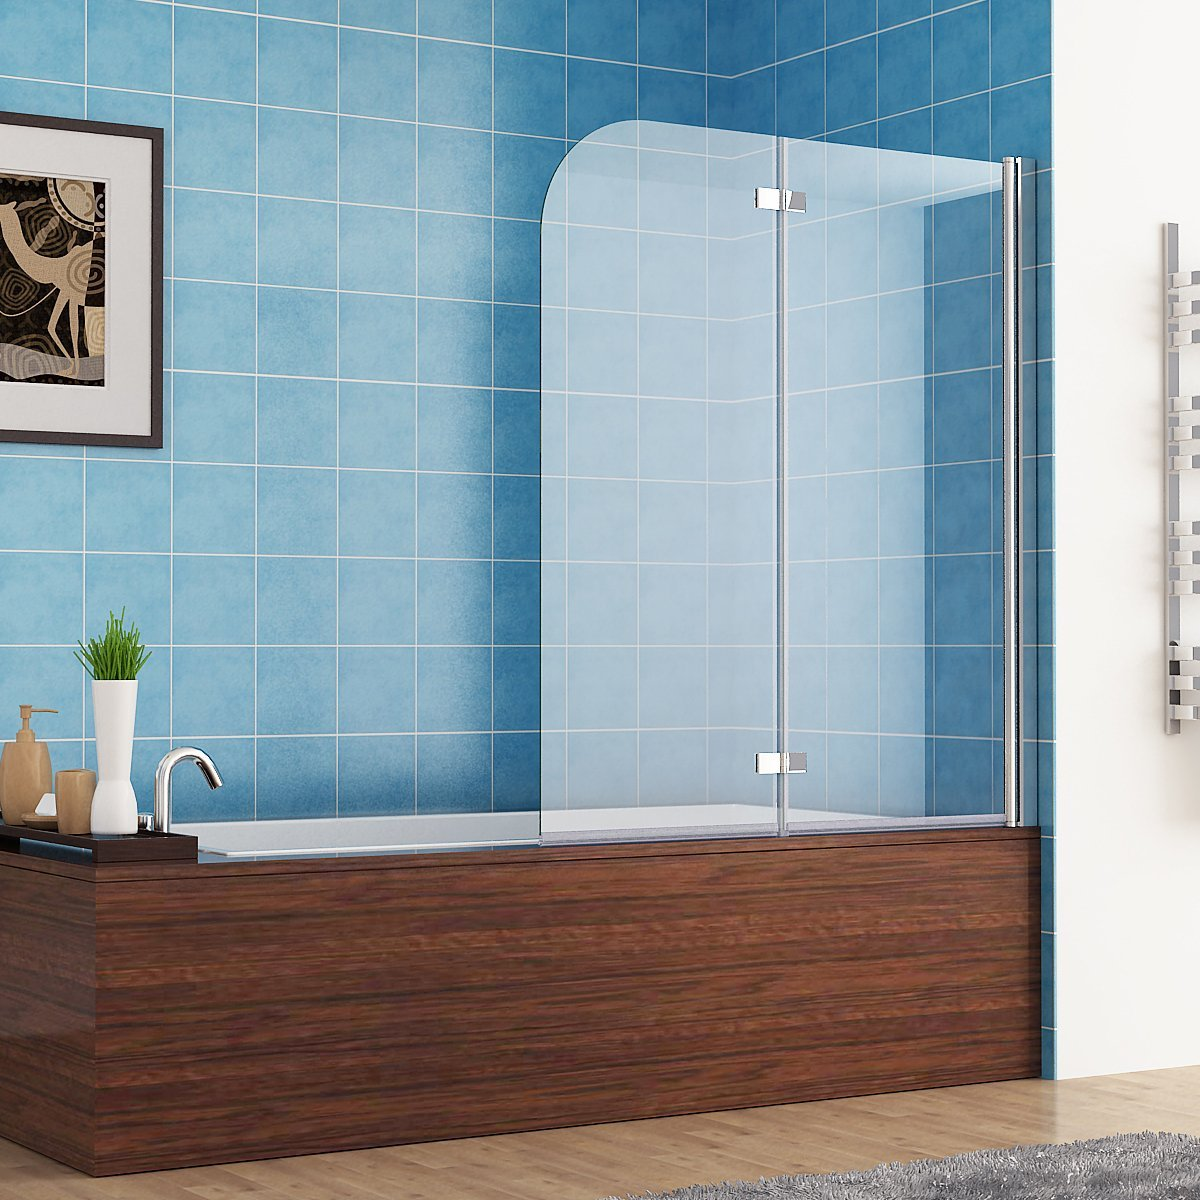 110 X 140 Cm Badewannen 2 Tlg Faltwand Aufsatz 180 Duschwand